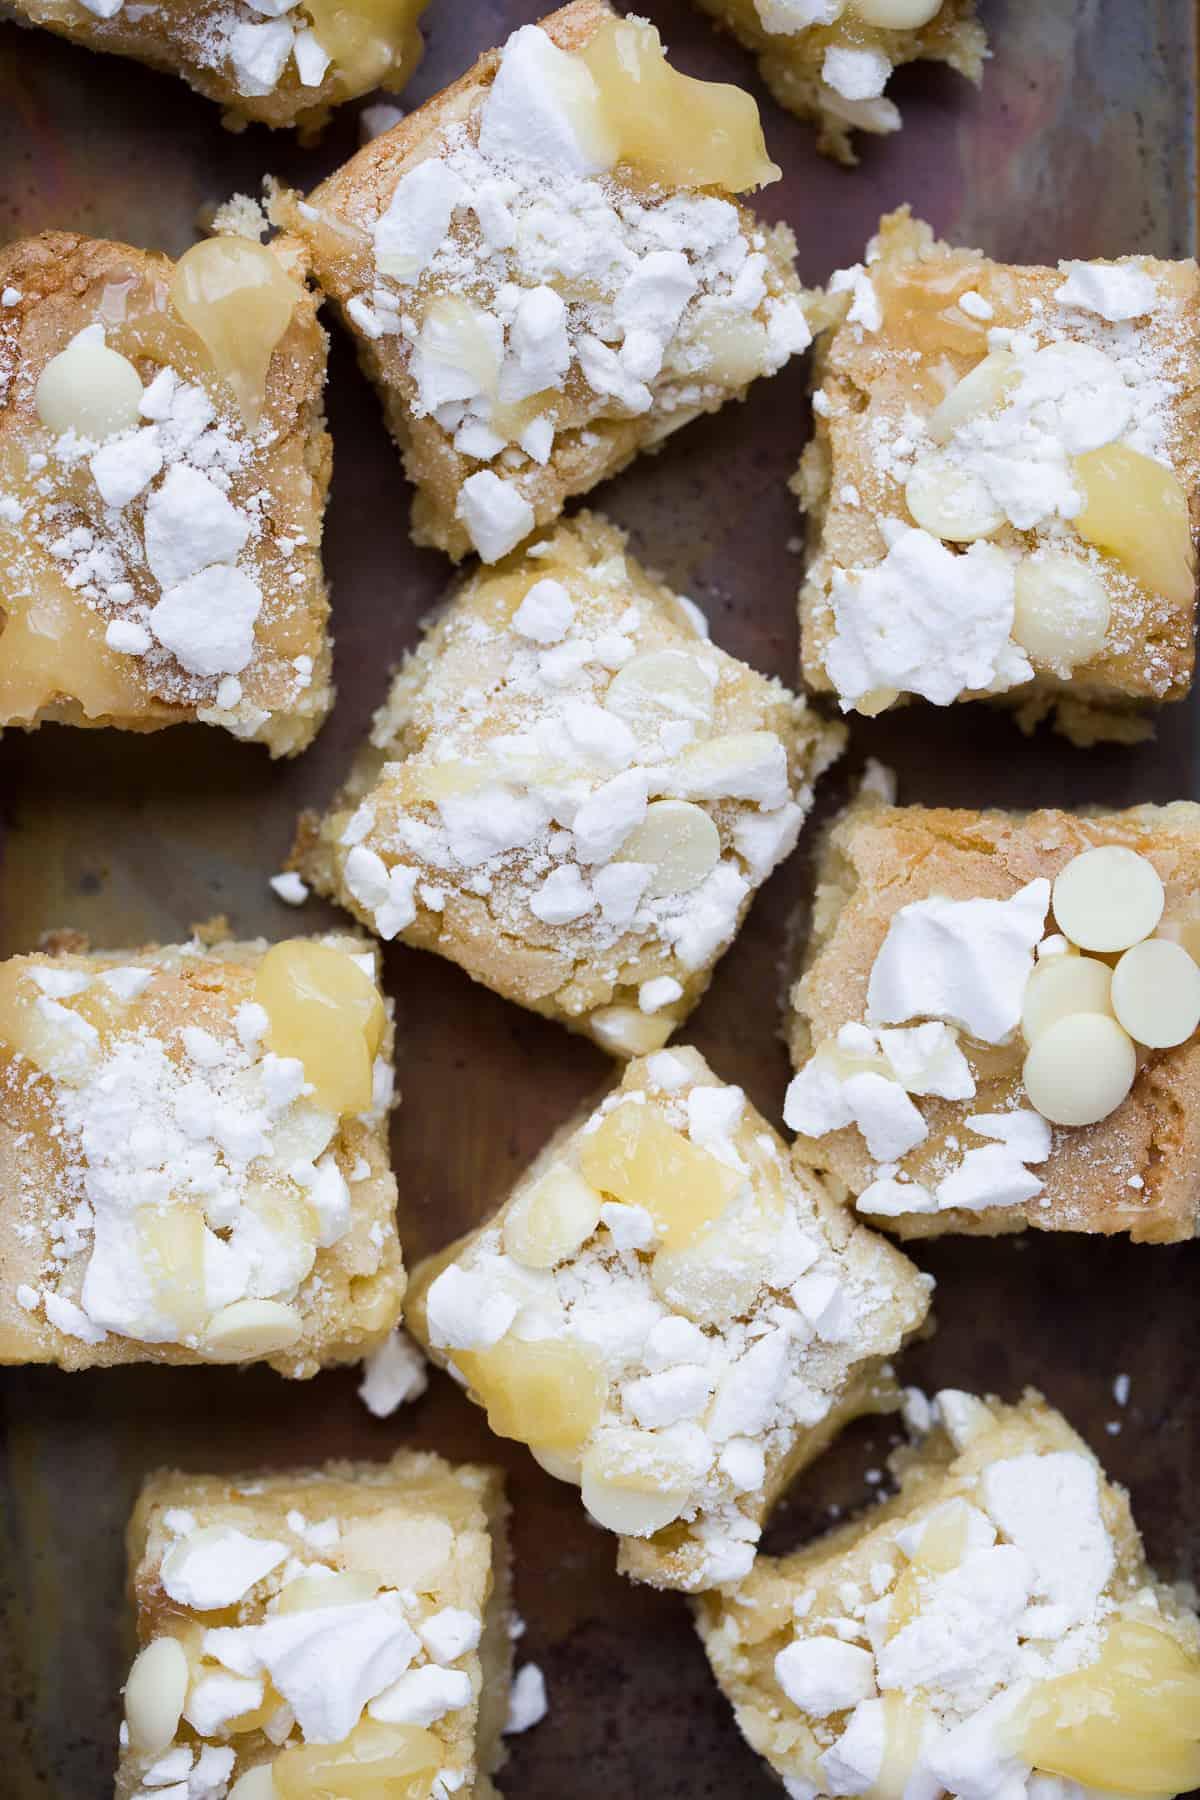 Squares of lemon meringue blondies on a dark coloured baking tray.